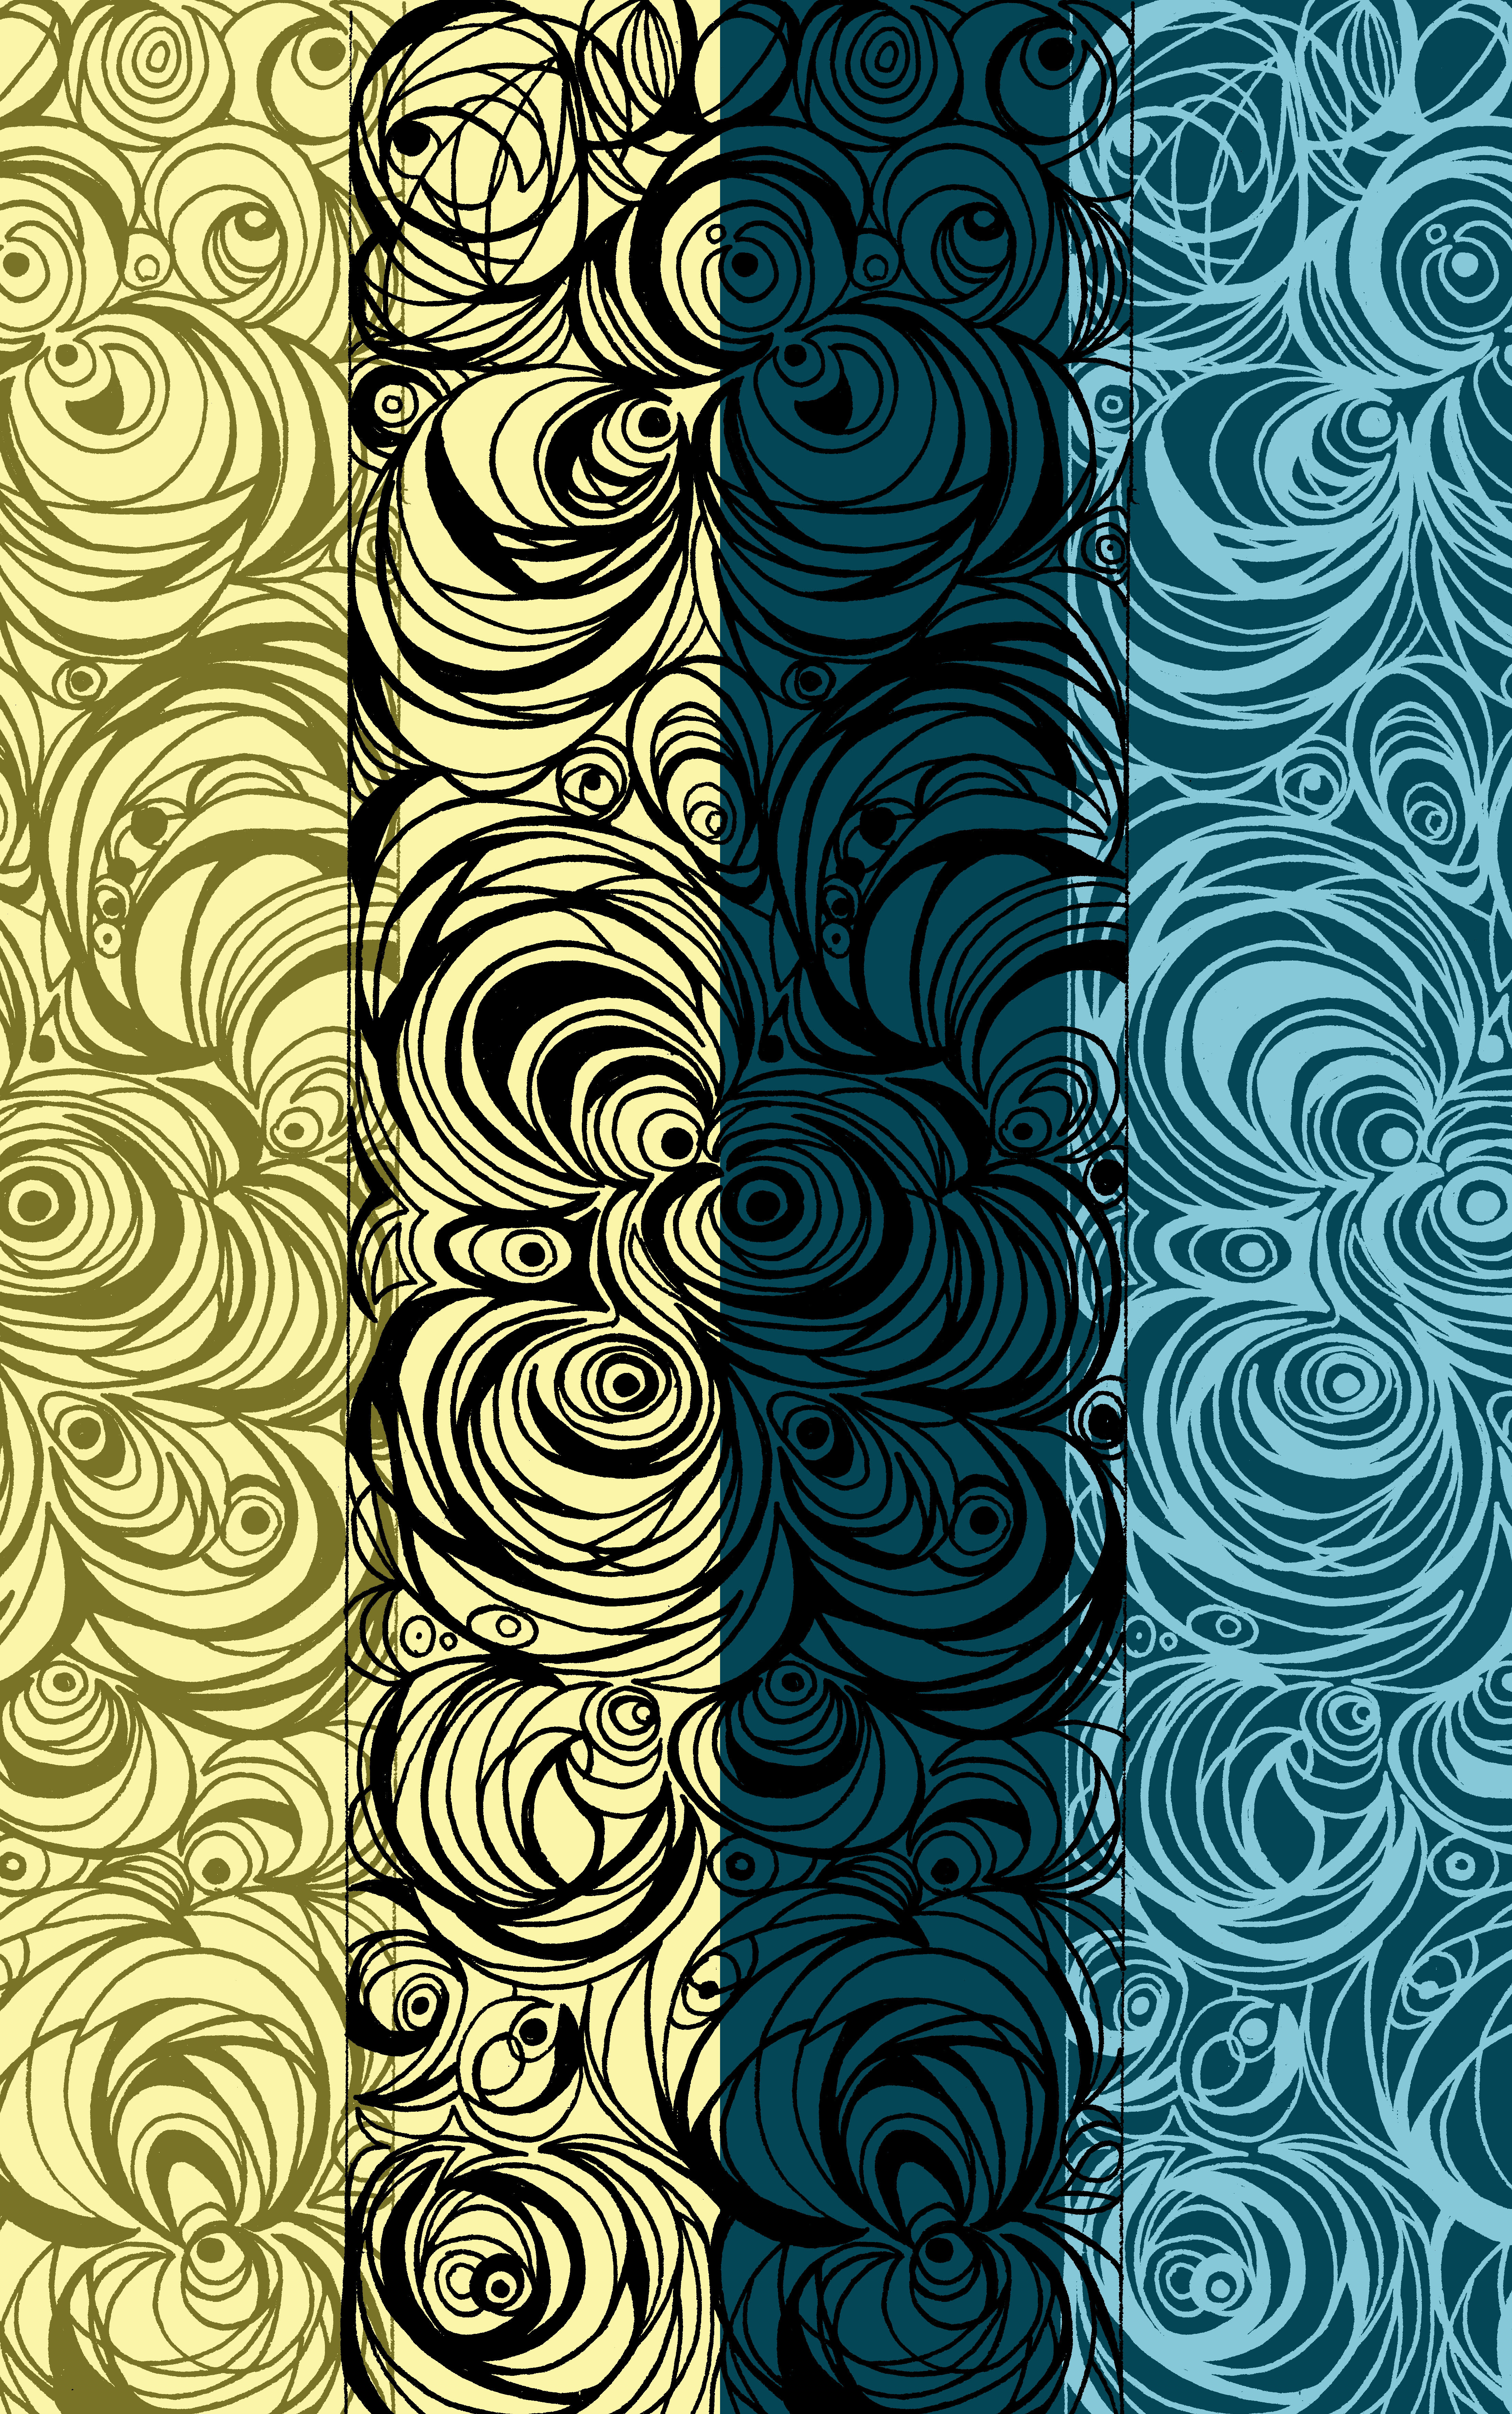 Pattern by avaschmava